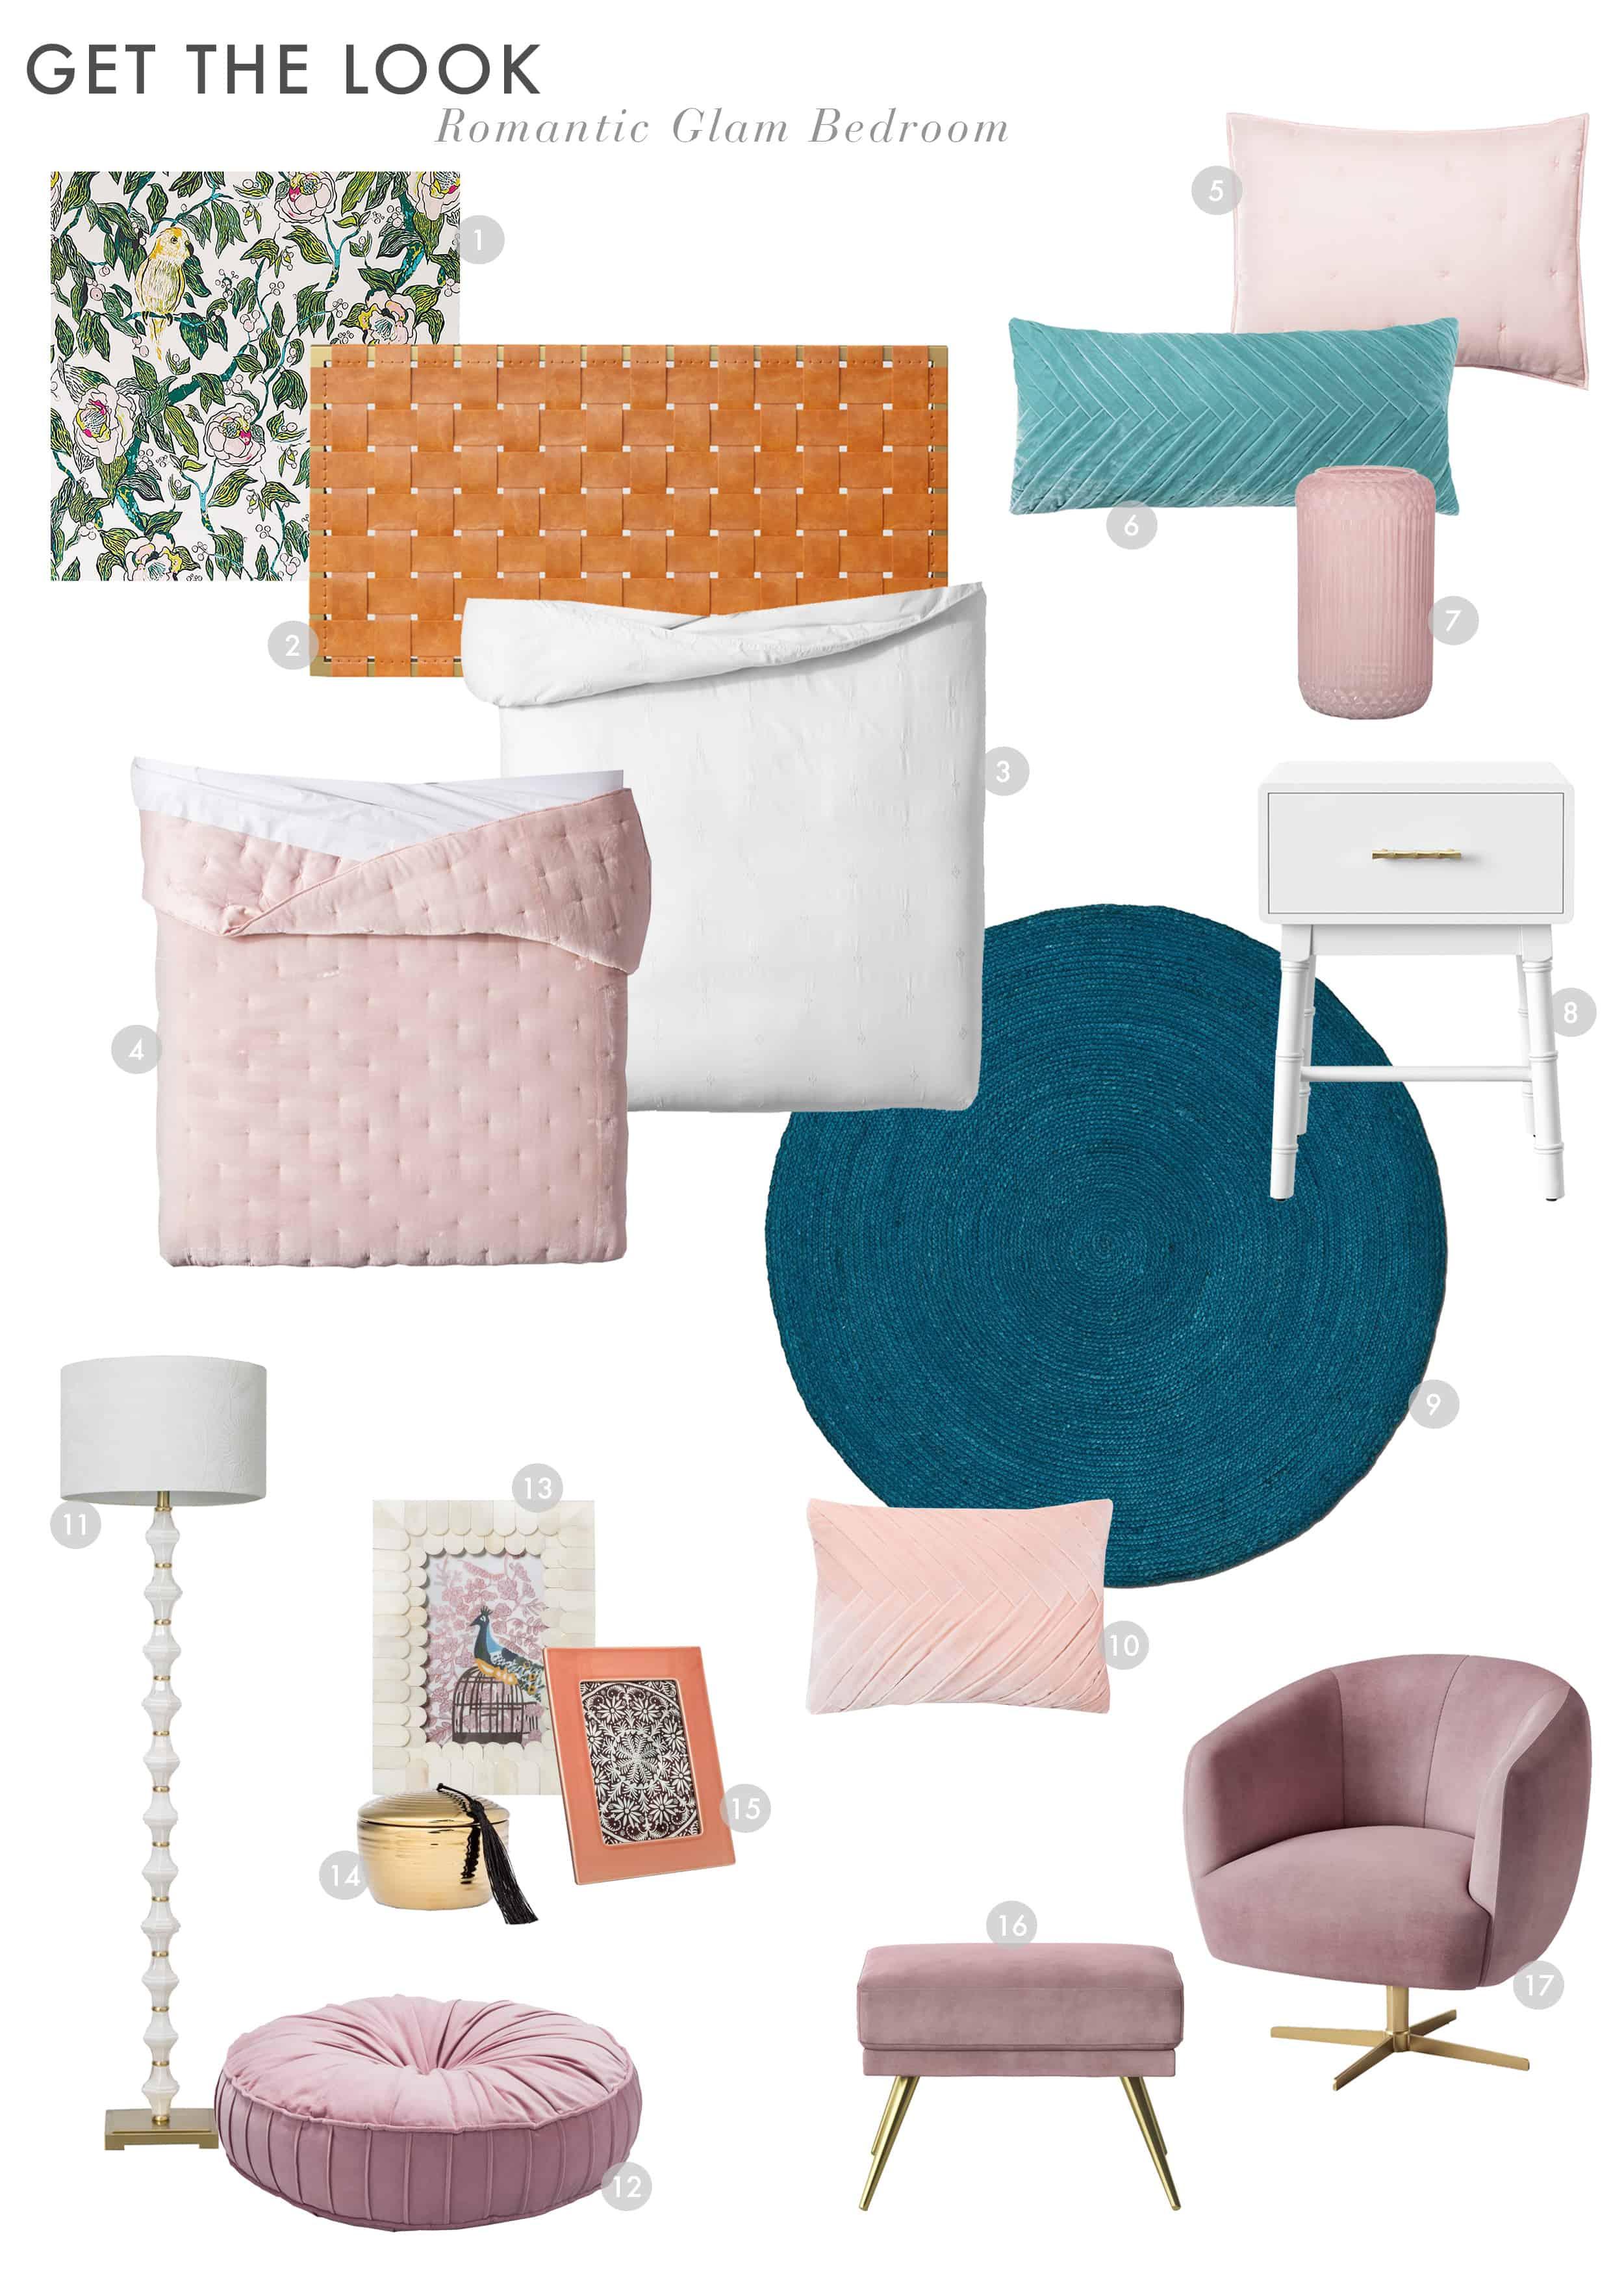 Emily Henderson Target Opalhouse Romantic Glam Bedroom Roundup